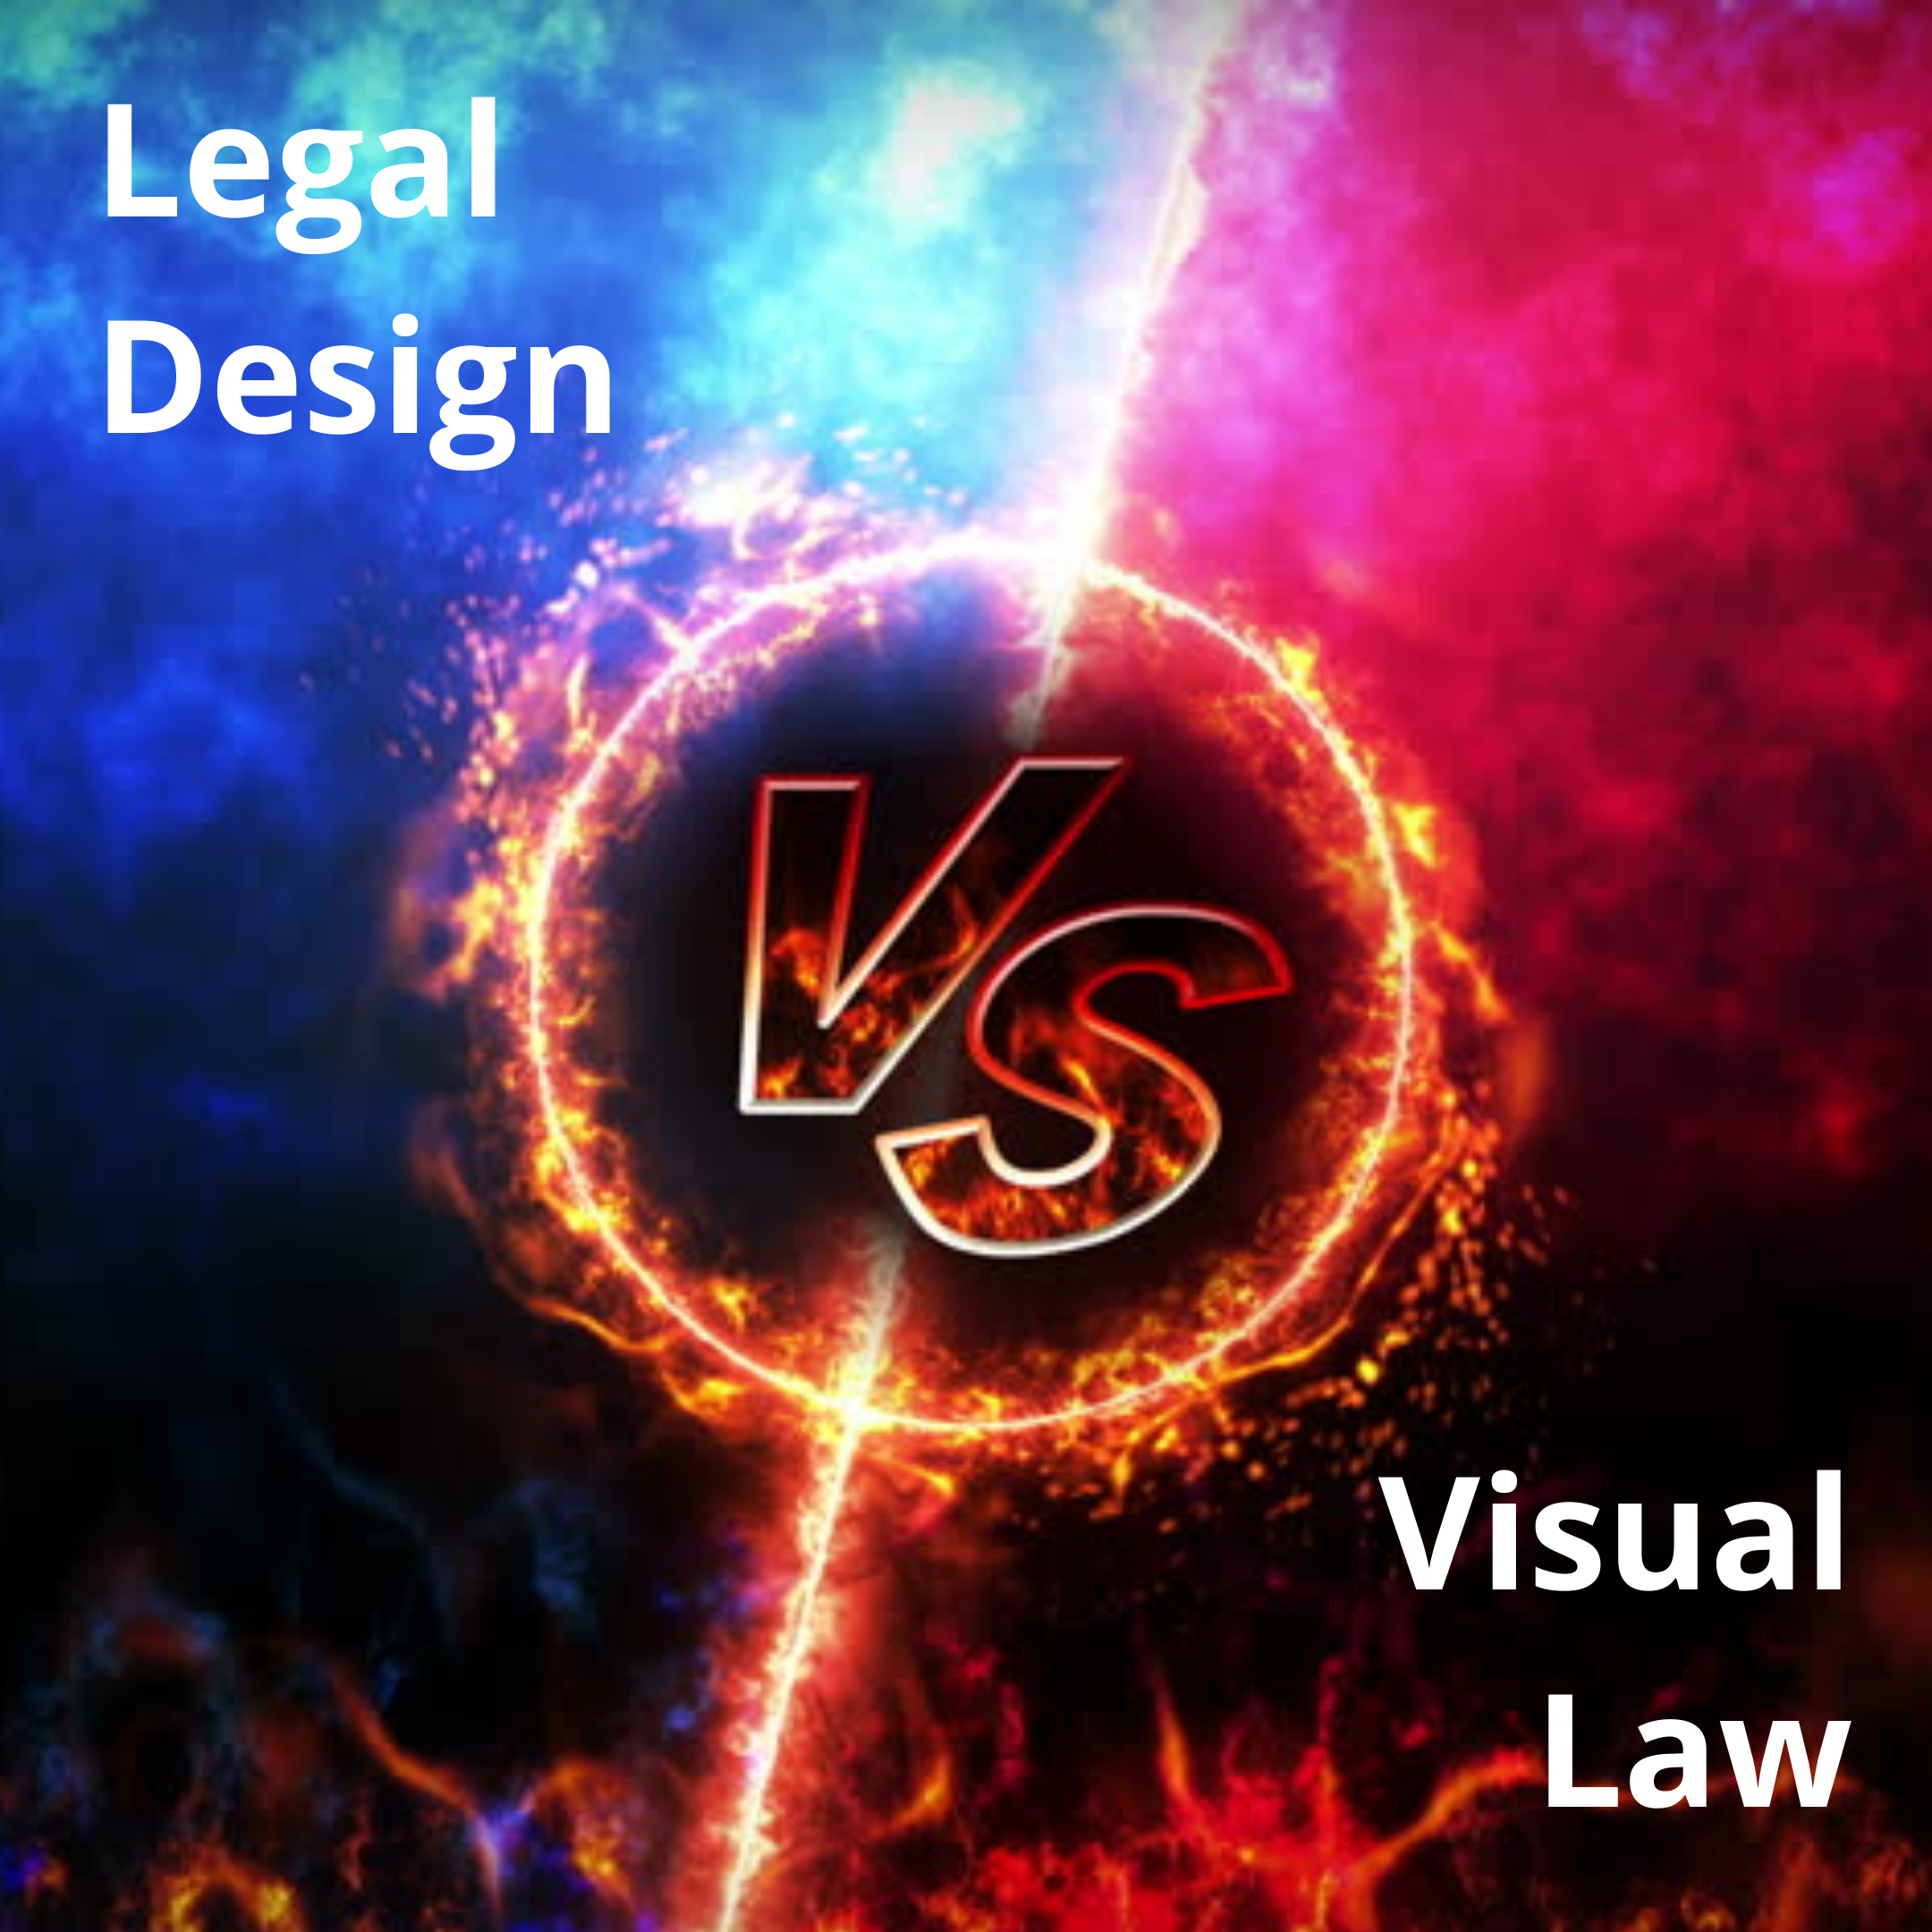 legal design ou visual law